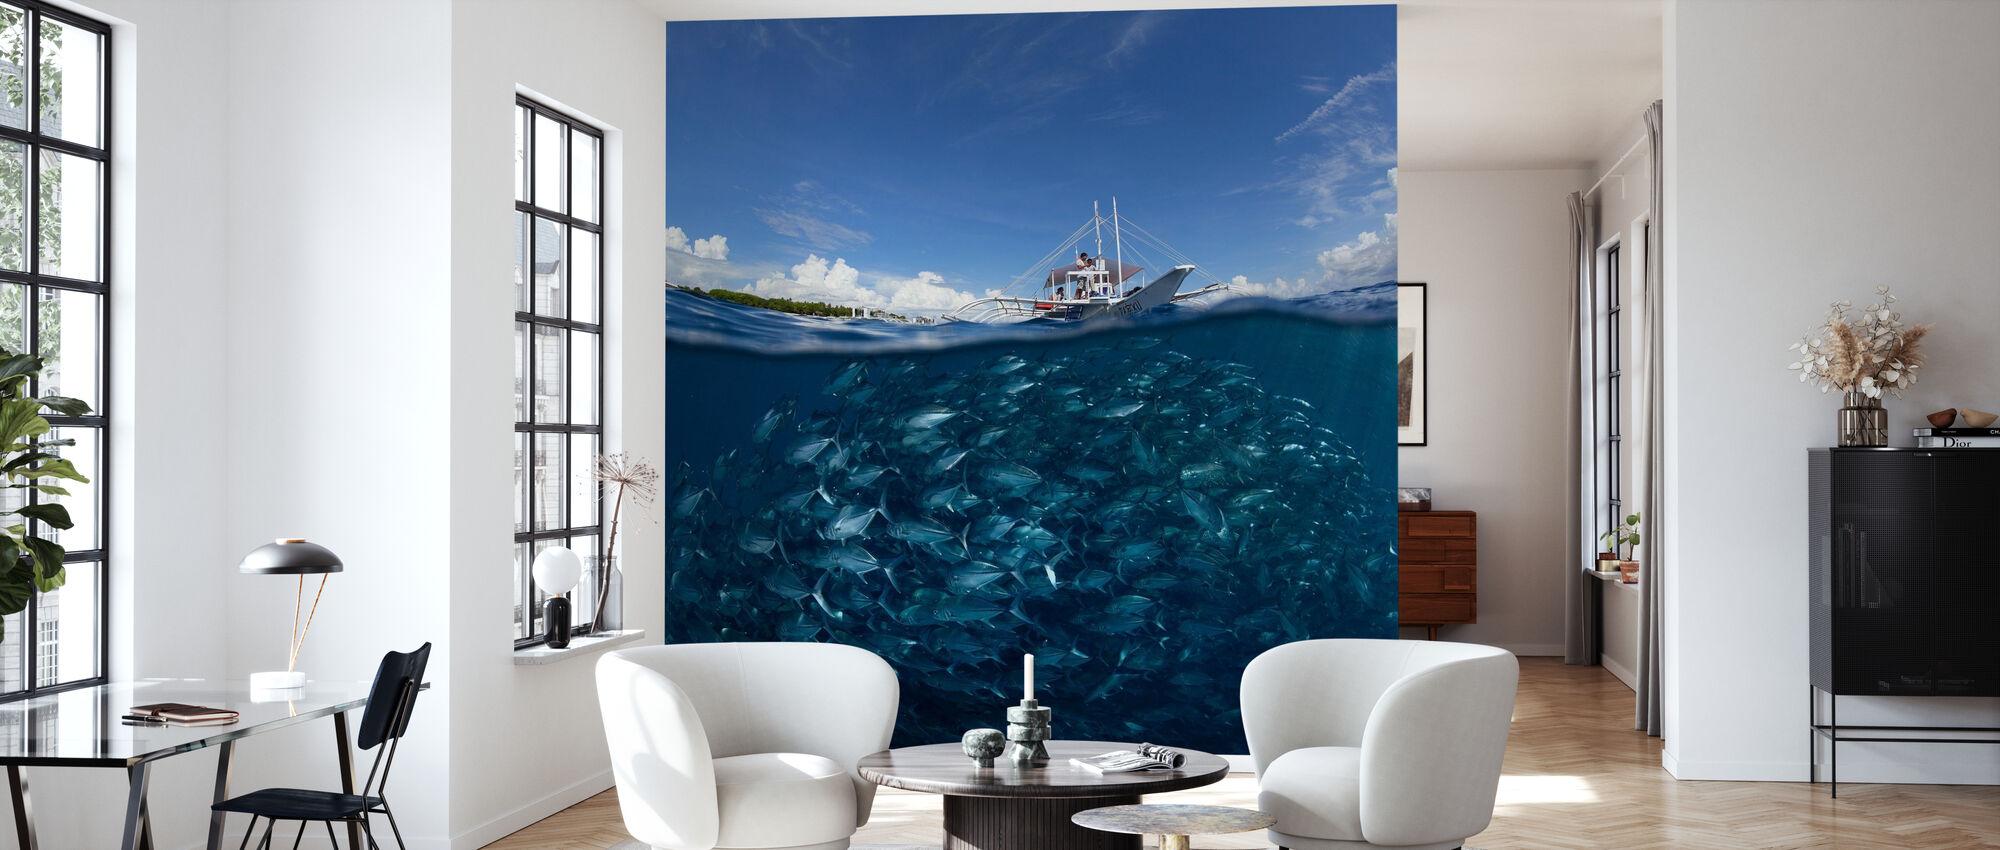 Go Diving - Wallpaper - Living Room